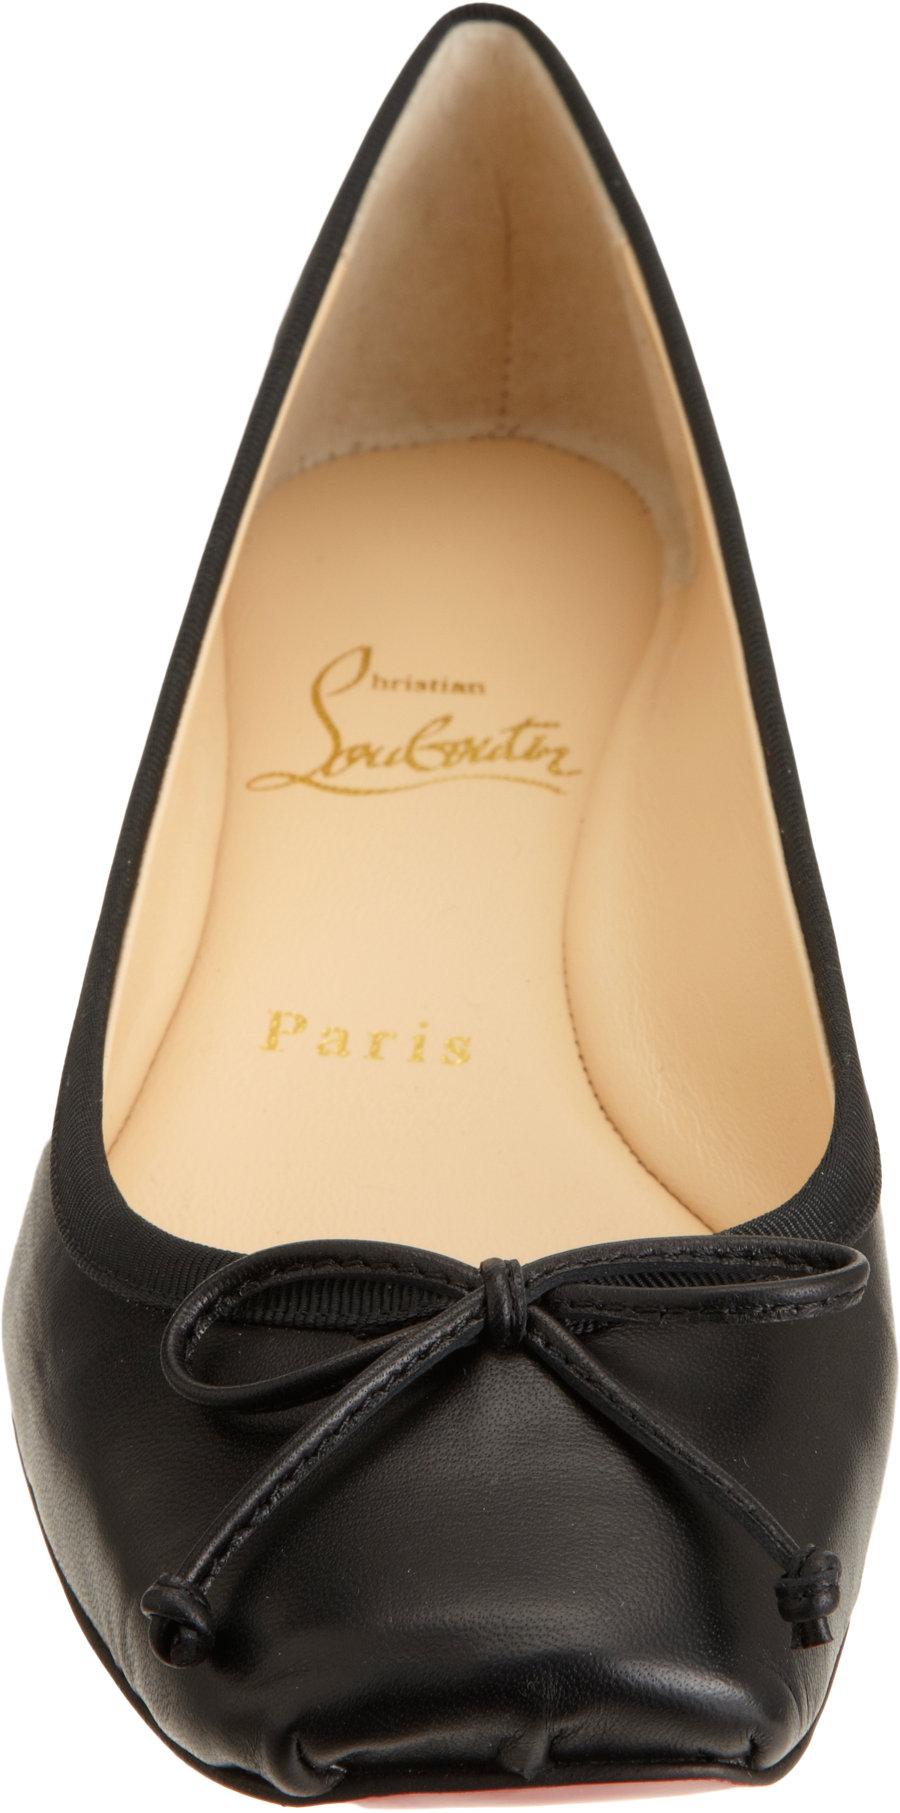 us replica shoes christian louboutin - christian-louboutin-red-rosella-product-2-12012262-582764413.jpeg